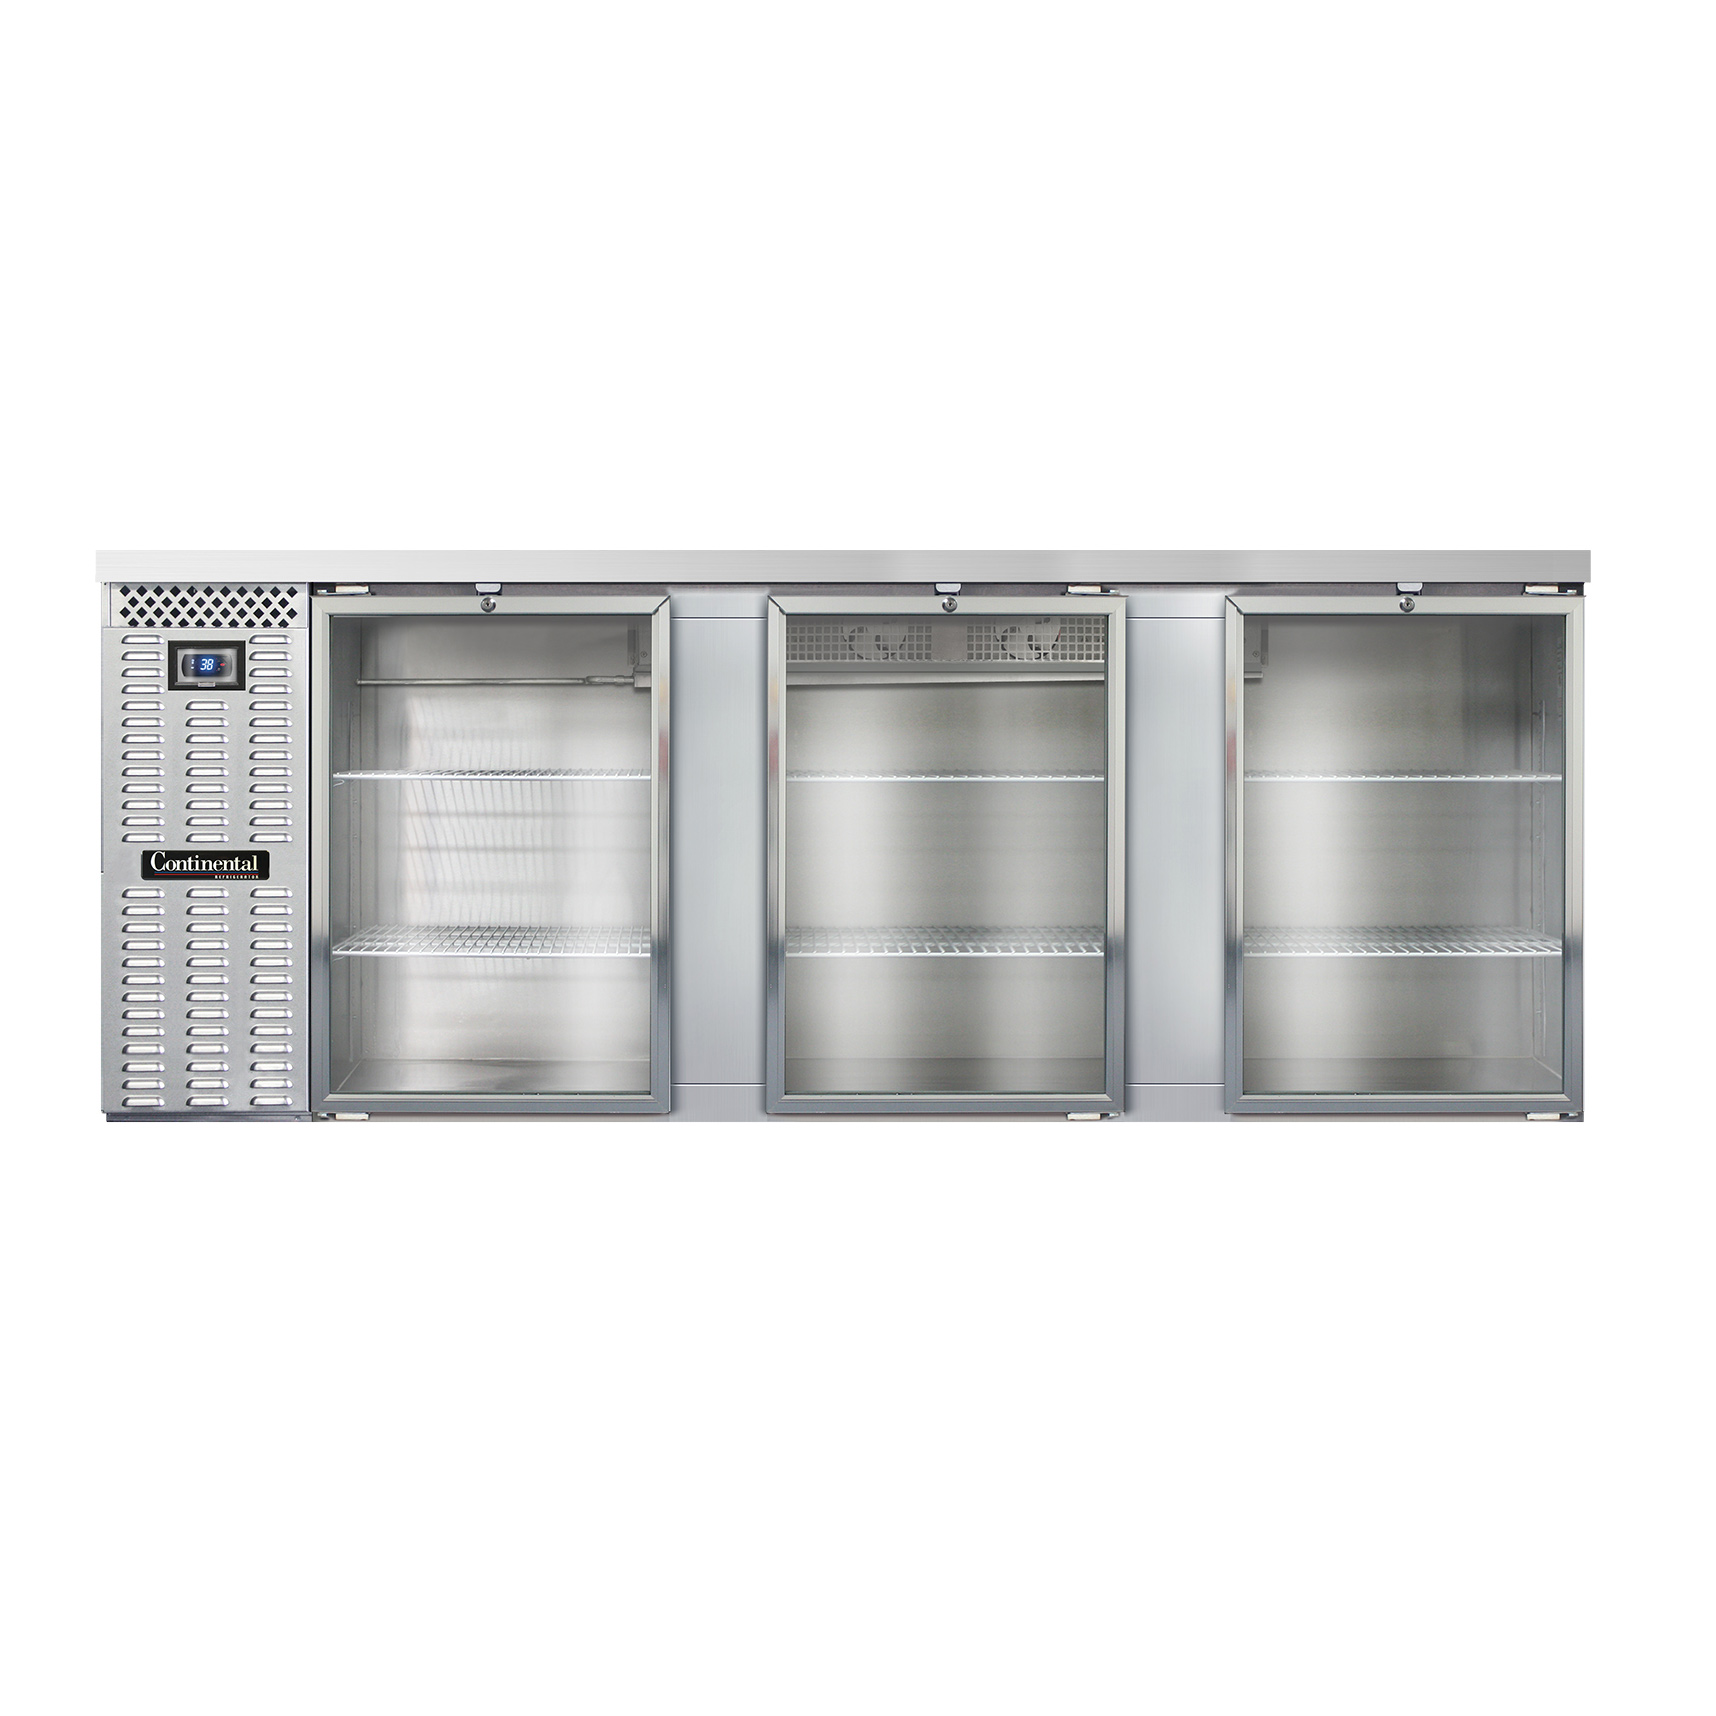 Continental Refrigerator BB90SNSSGD back bar cabinet, refrigerated